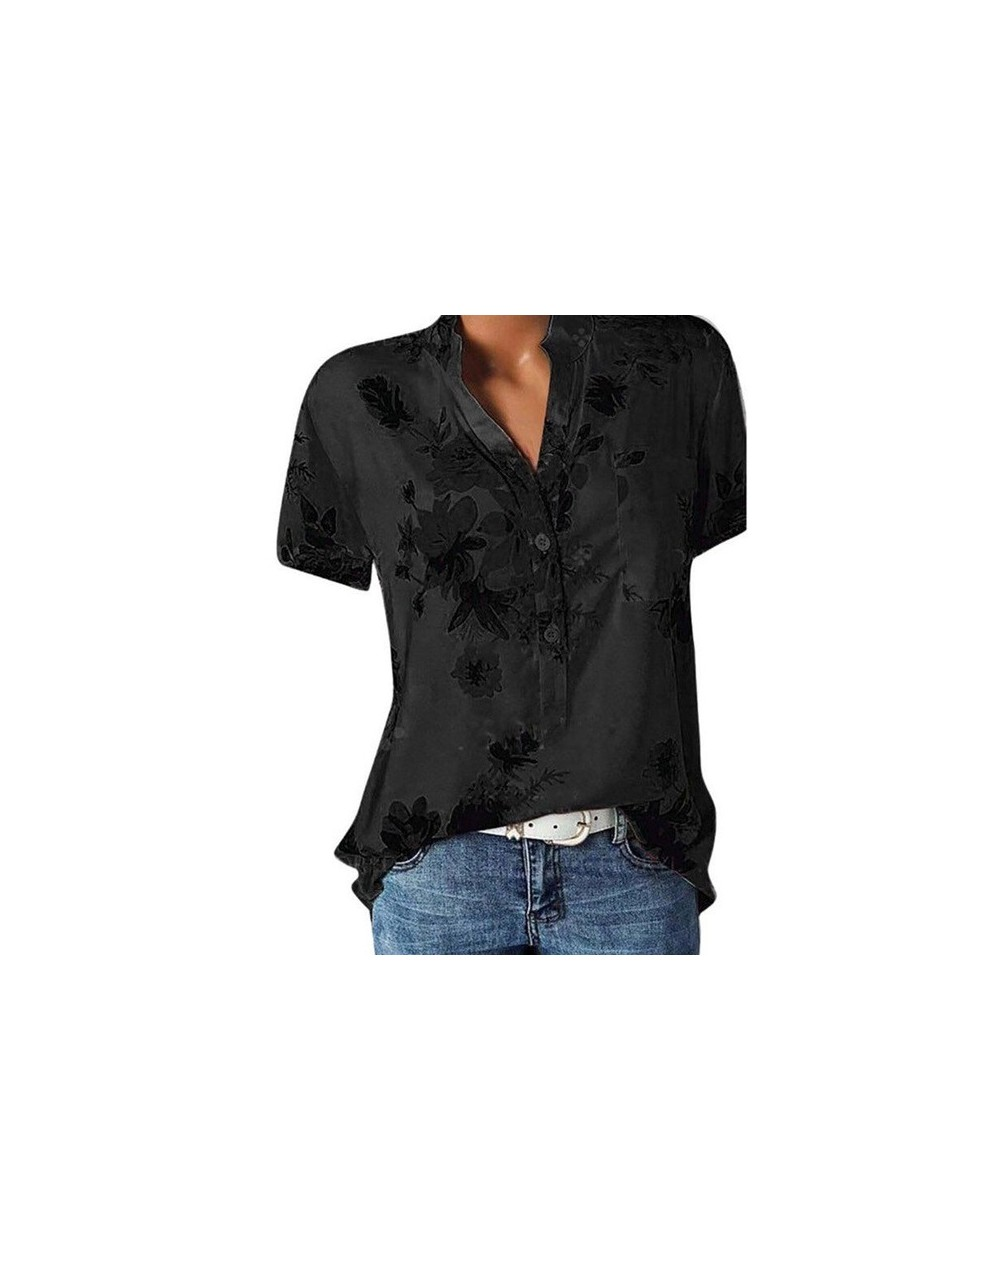 Elegant women's shirt printing large size casual shirt fashion V-neck short-sleeved shirt blouse - Black - 494157720312-1